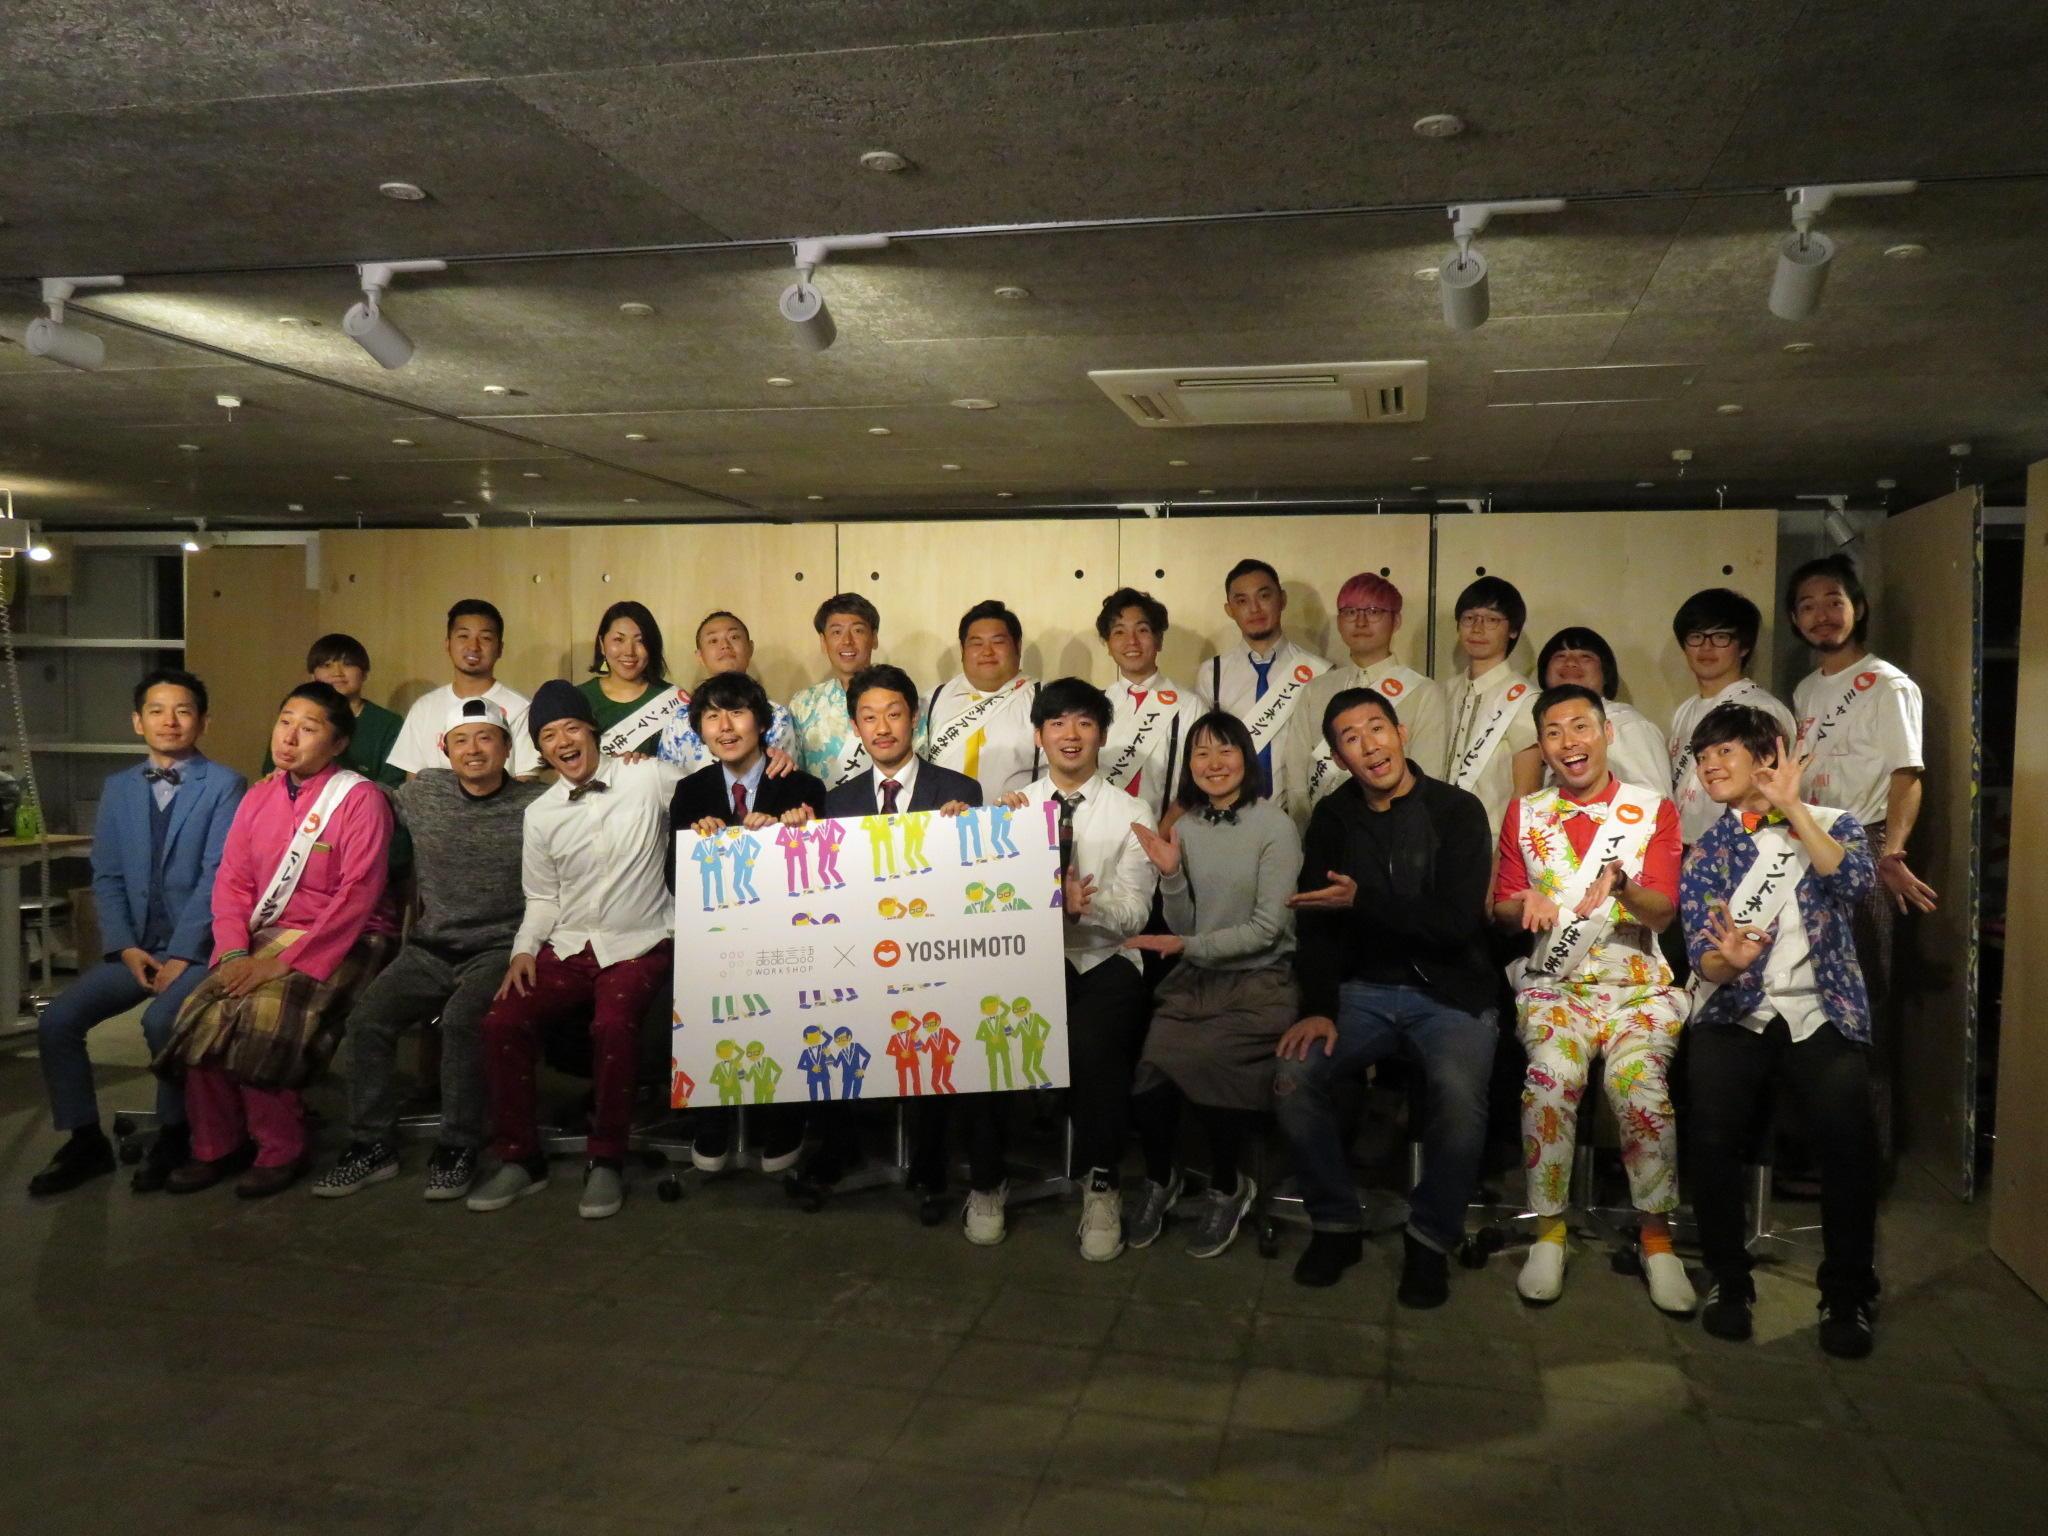 http://news.yoshimoto.co.jp/20181230134821-8336d982b9ec3d77b882597852b1dcfd5f9e02bb.jpg